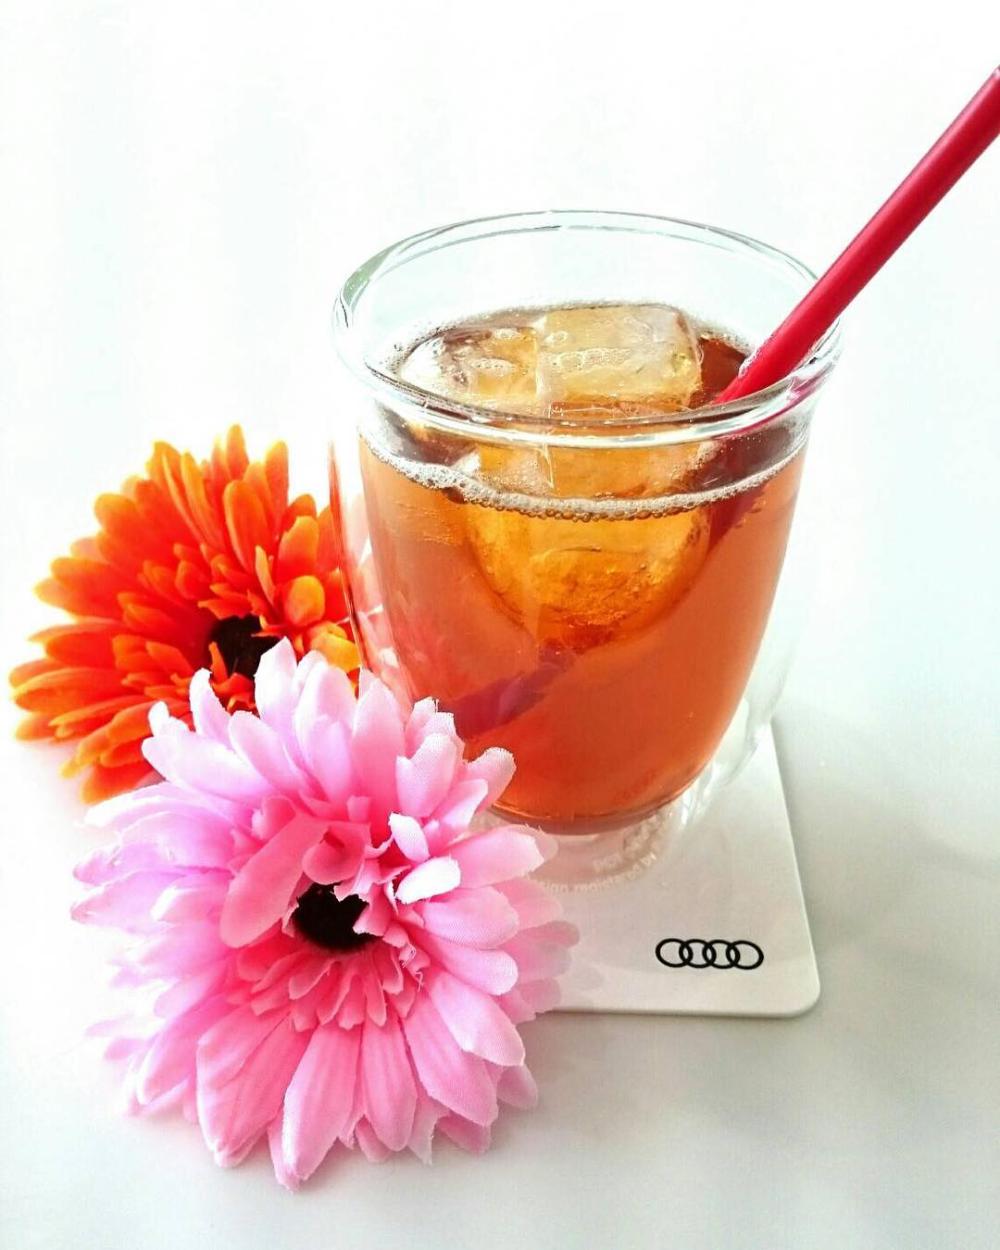 Audi Jackson.rinku Instagram post (photo) 皆様こんにちは! 毎月恒例... Audi Jackson.rin